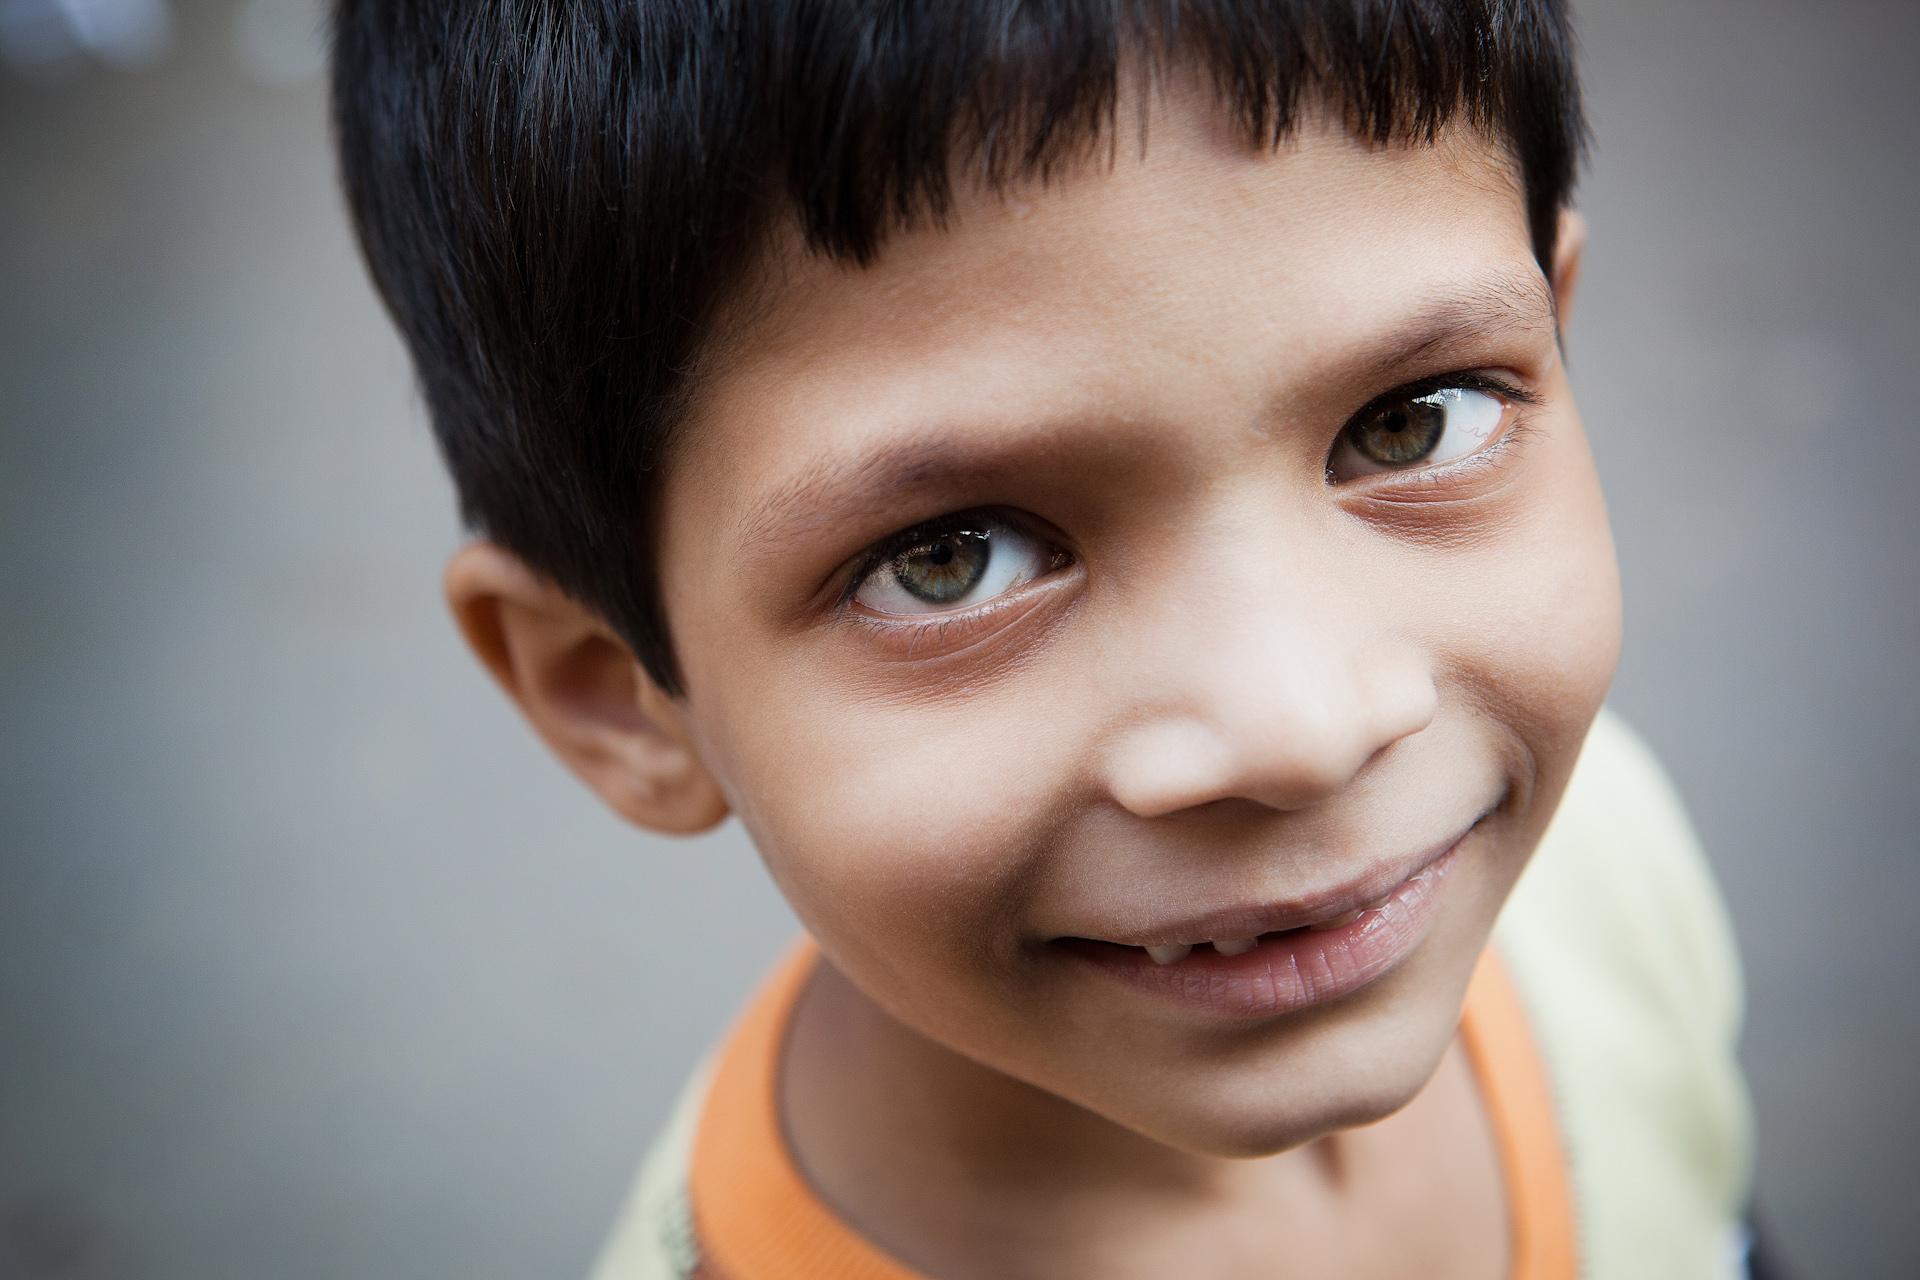 India-Travel-Rajasthan-Jodhpur-Child-Portrait-8.JPG